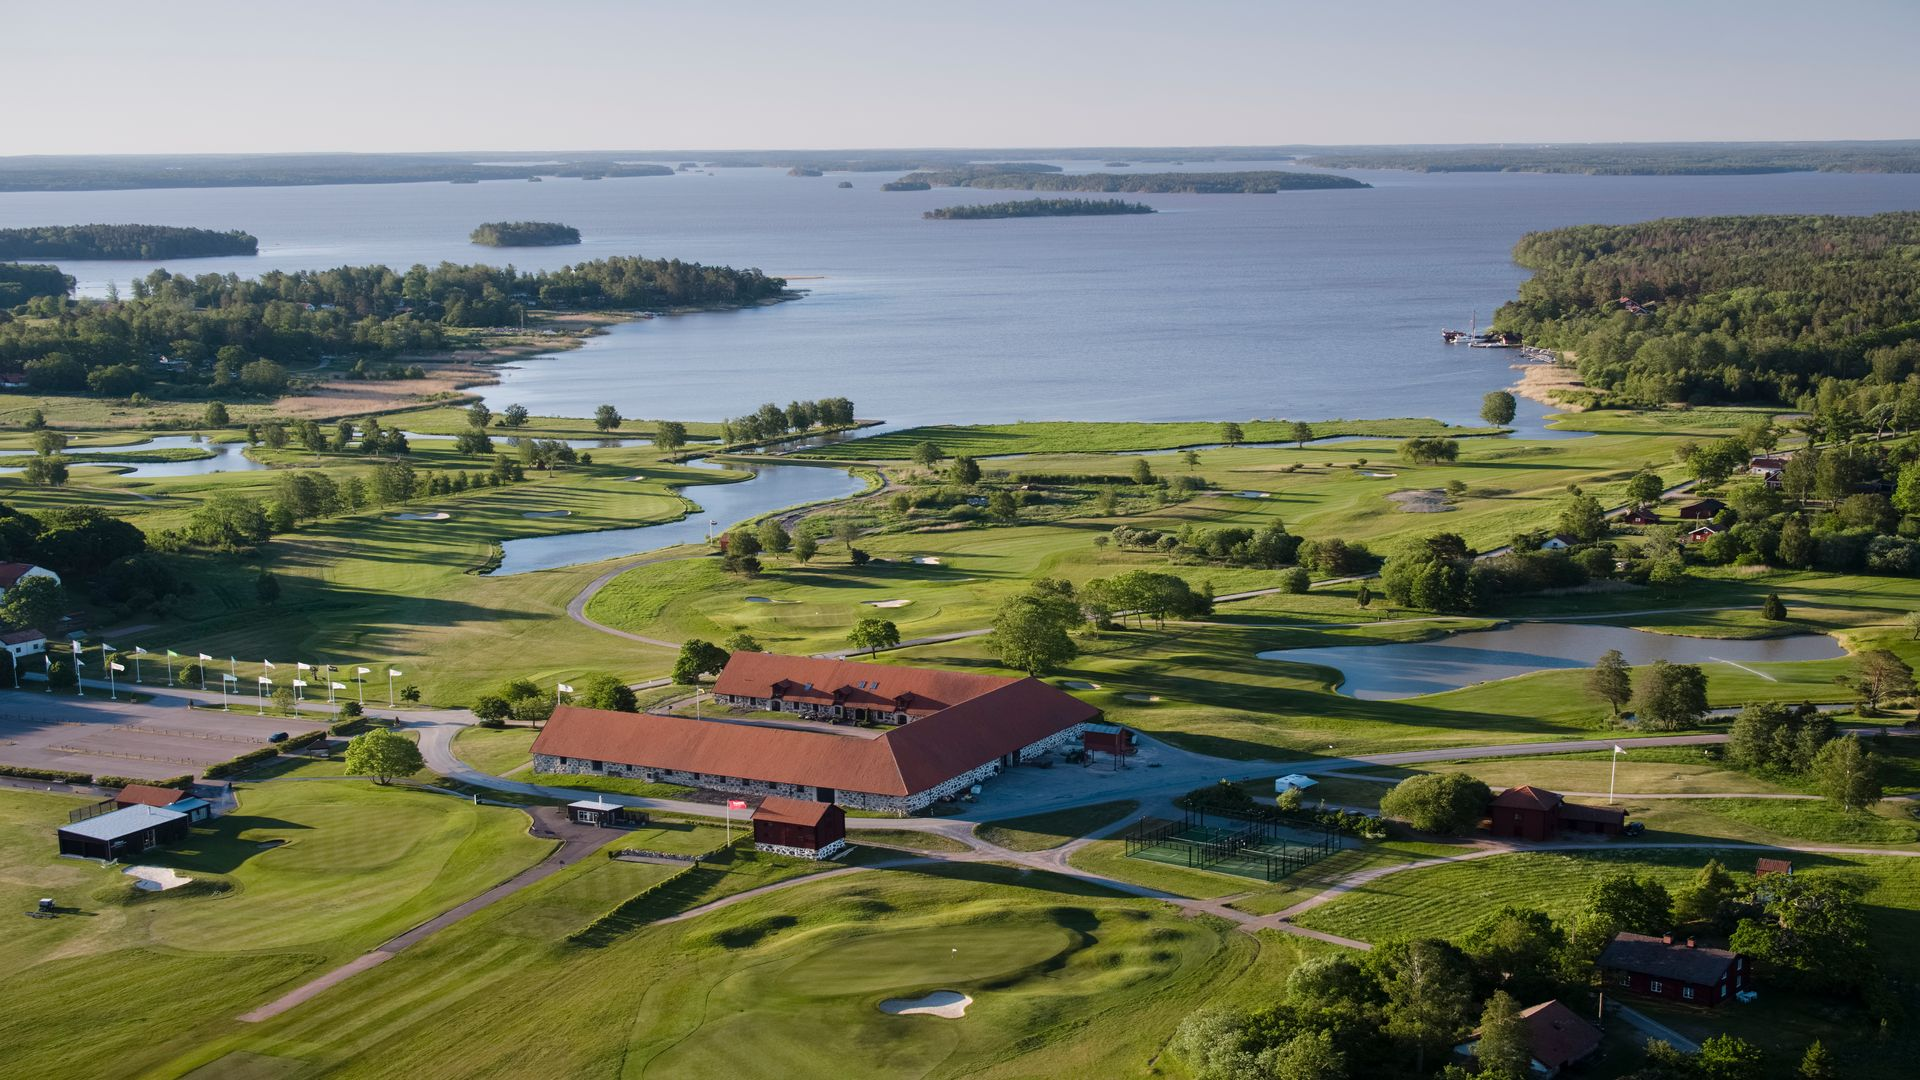 Vybild på Frösåkers Golf & Country Club. Fotograf: Jacob Sjöman/Pressbild